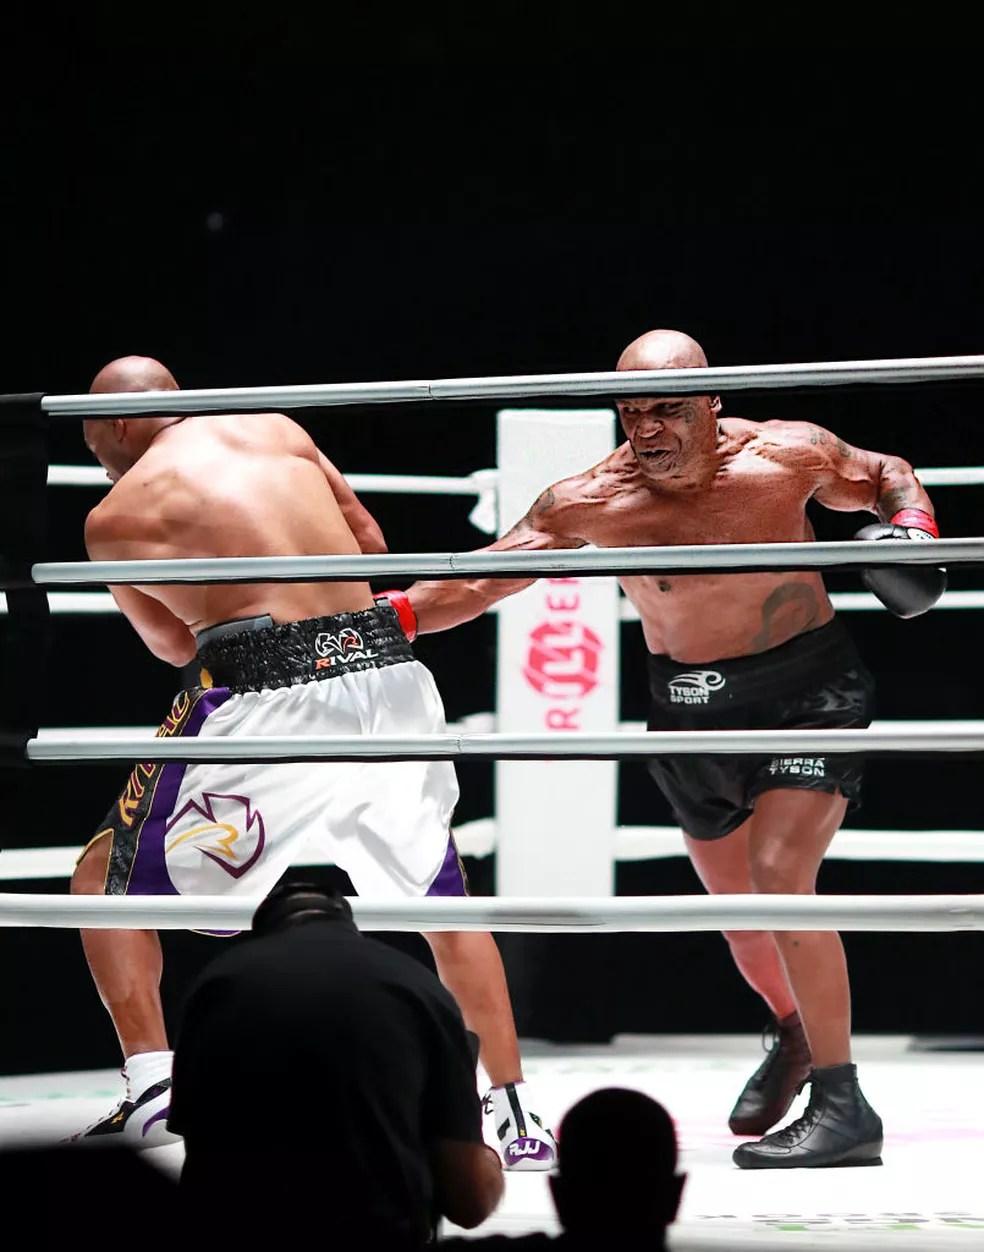 Mike Tyson voltou aos ringues contra Roy Jones Jr. no ano passado — Foto: Joe Scarnici/Getty Images for Triller